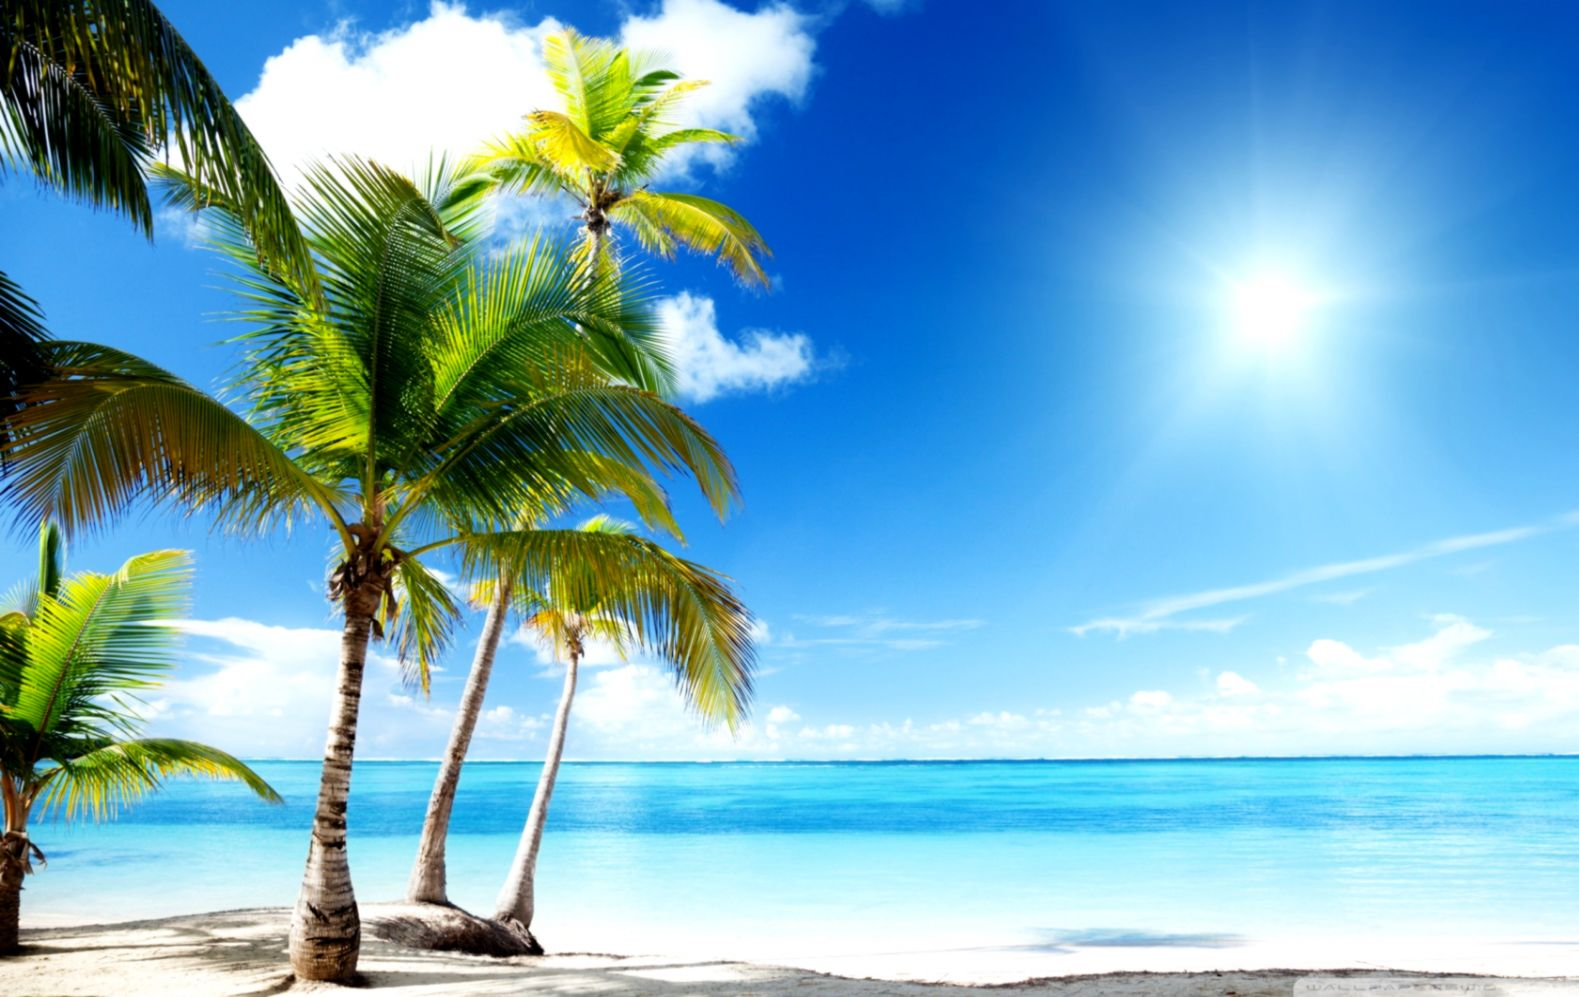 Tropical Beach Paradise 4k Hd Desktop Wallpaper For ...